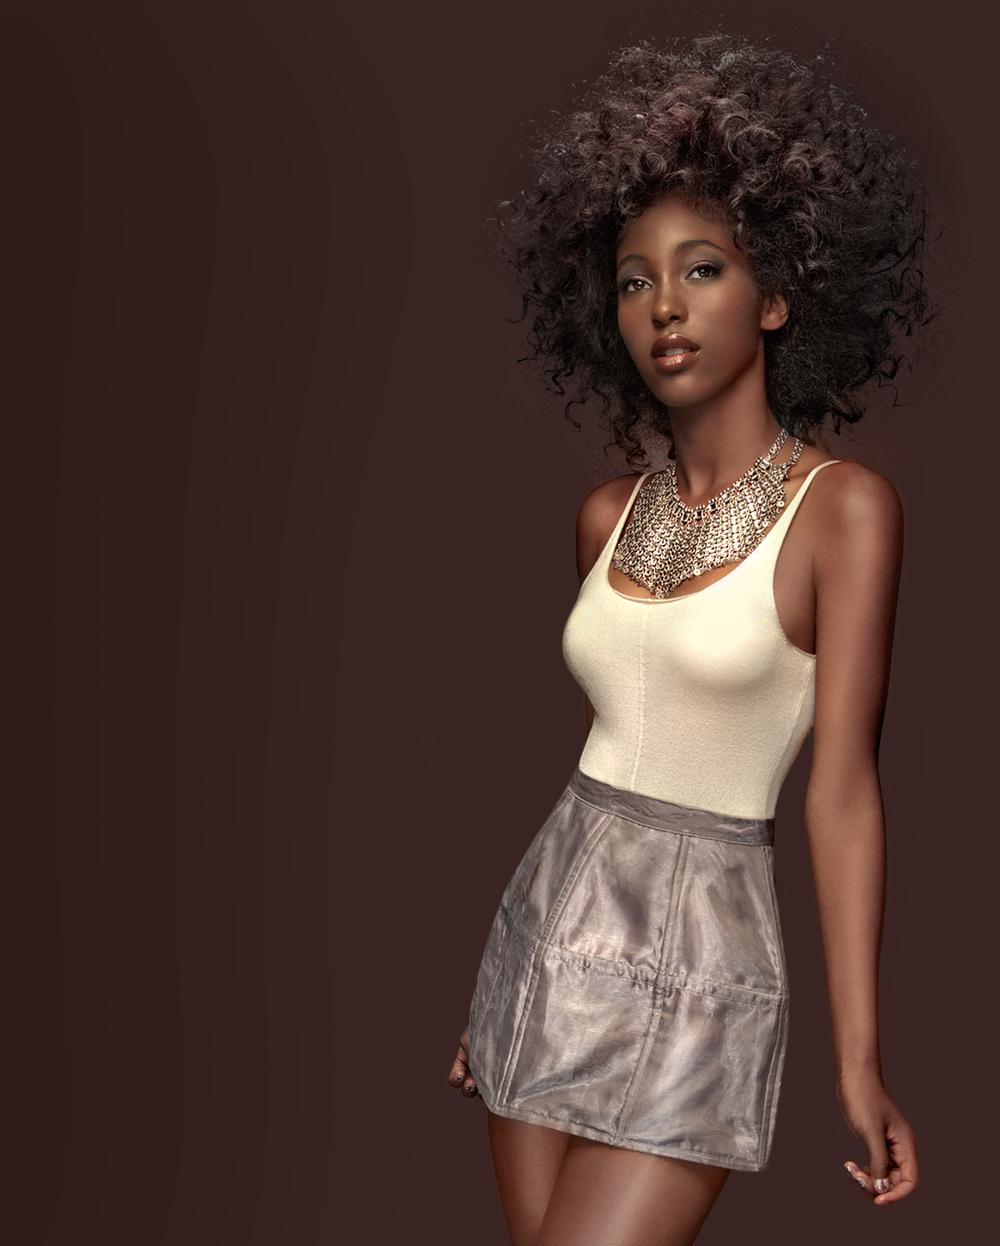 Hair Salon Magazine, beauty, digital edited at Thomas Canny Studio.jpg